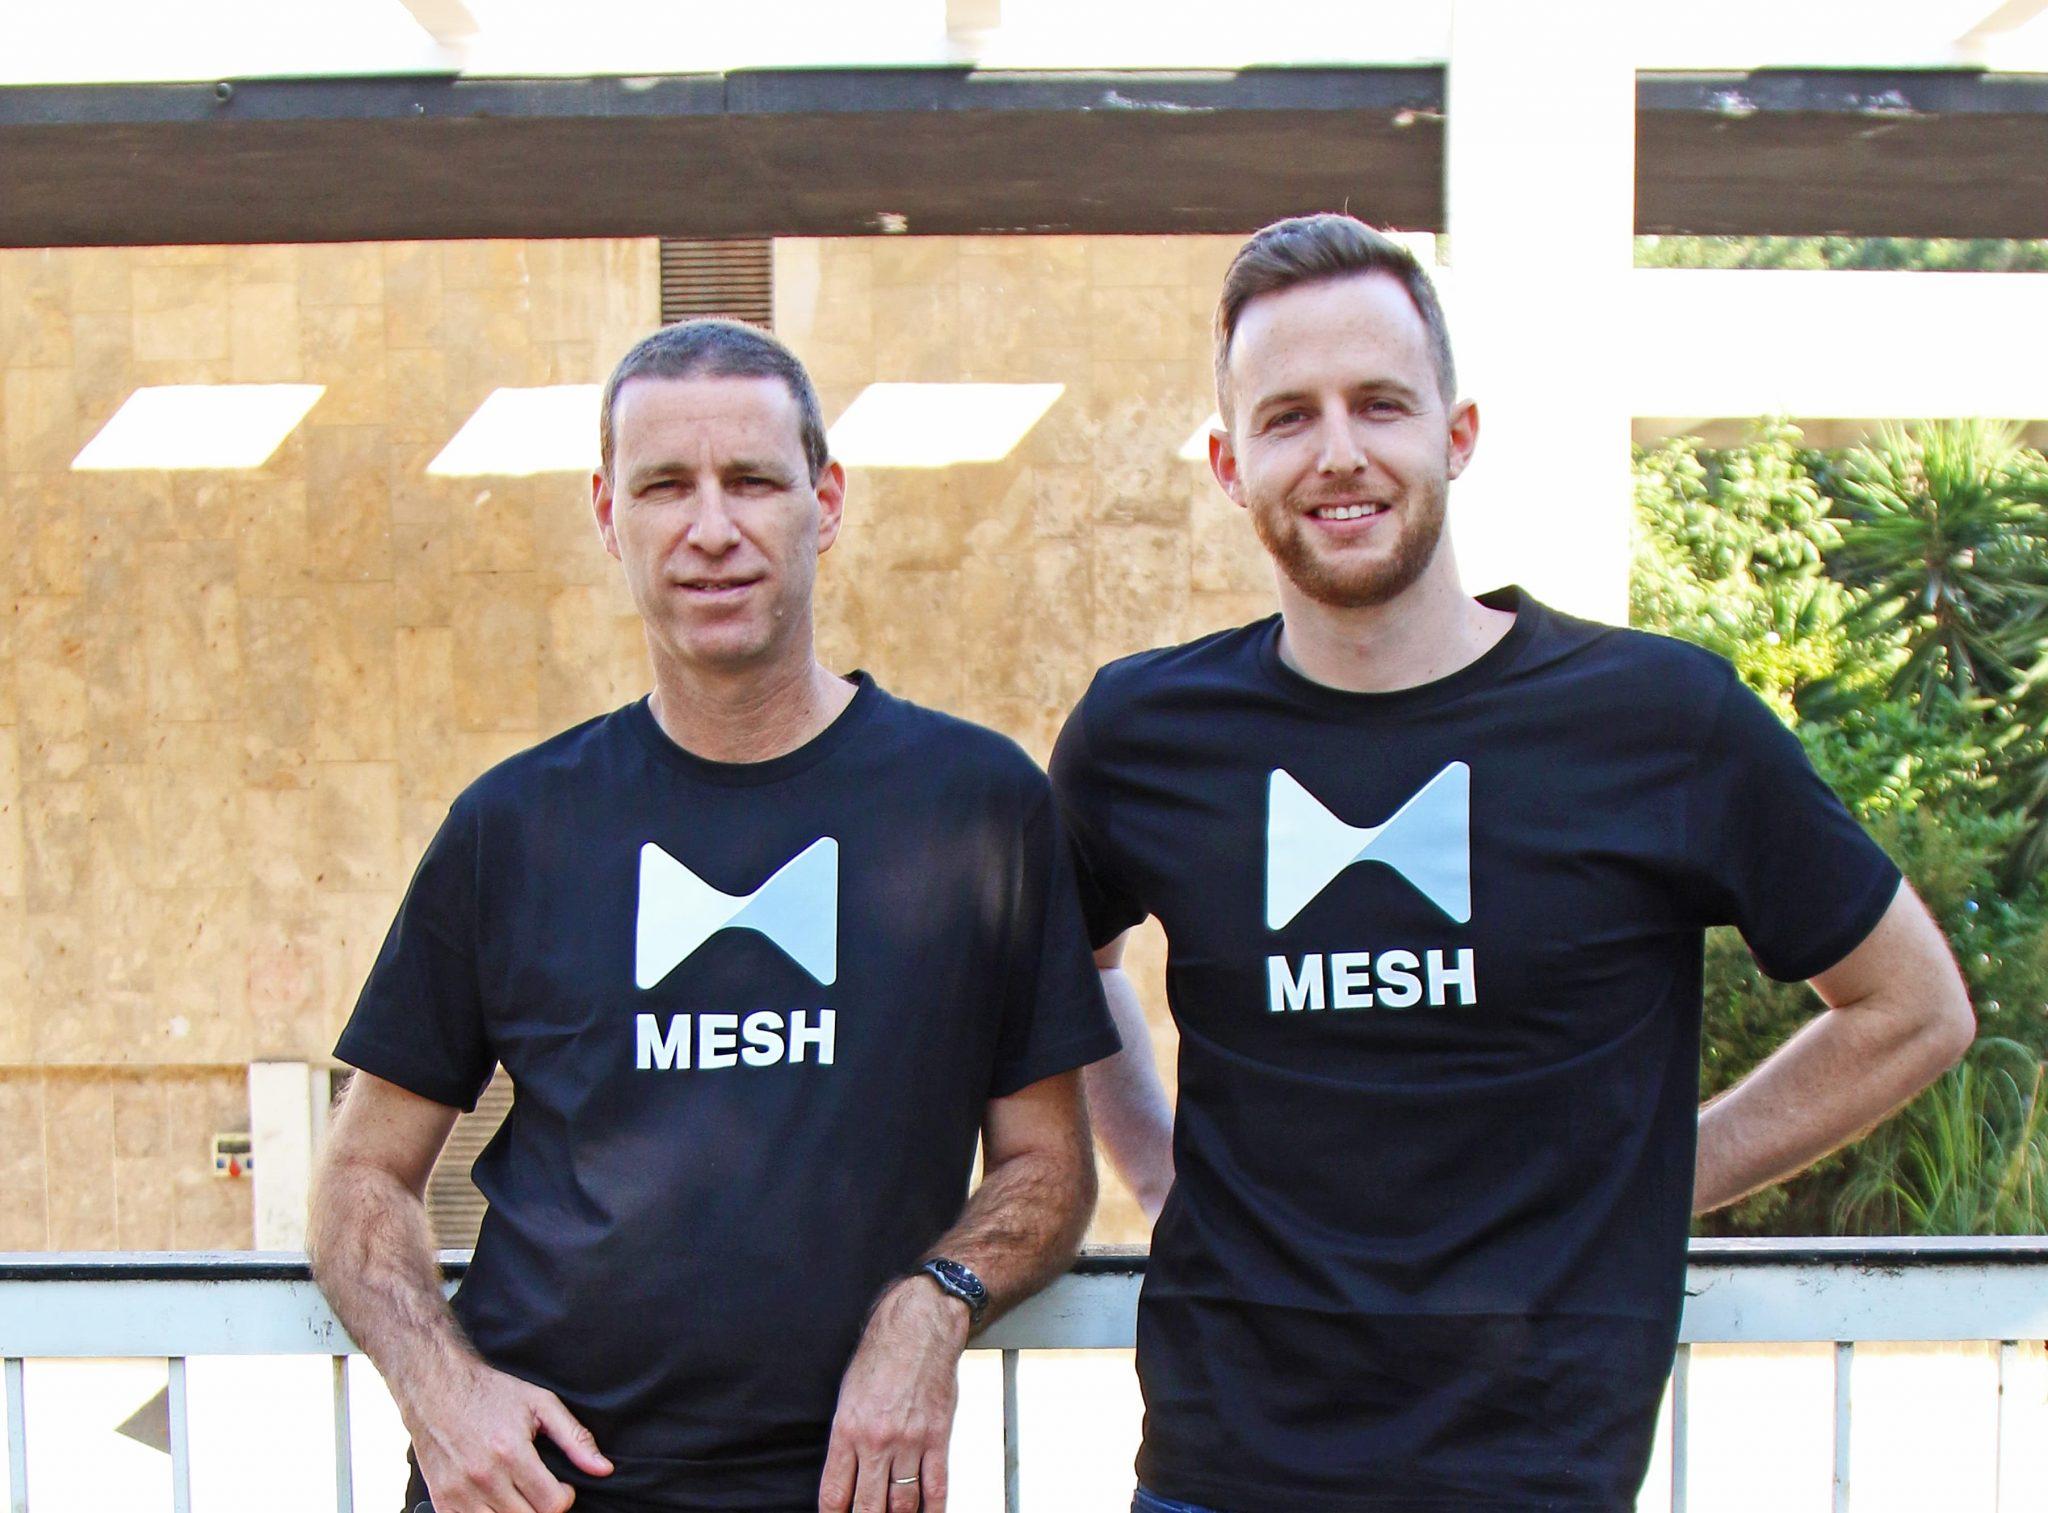 Mesh team